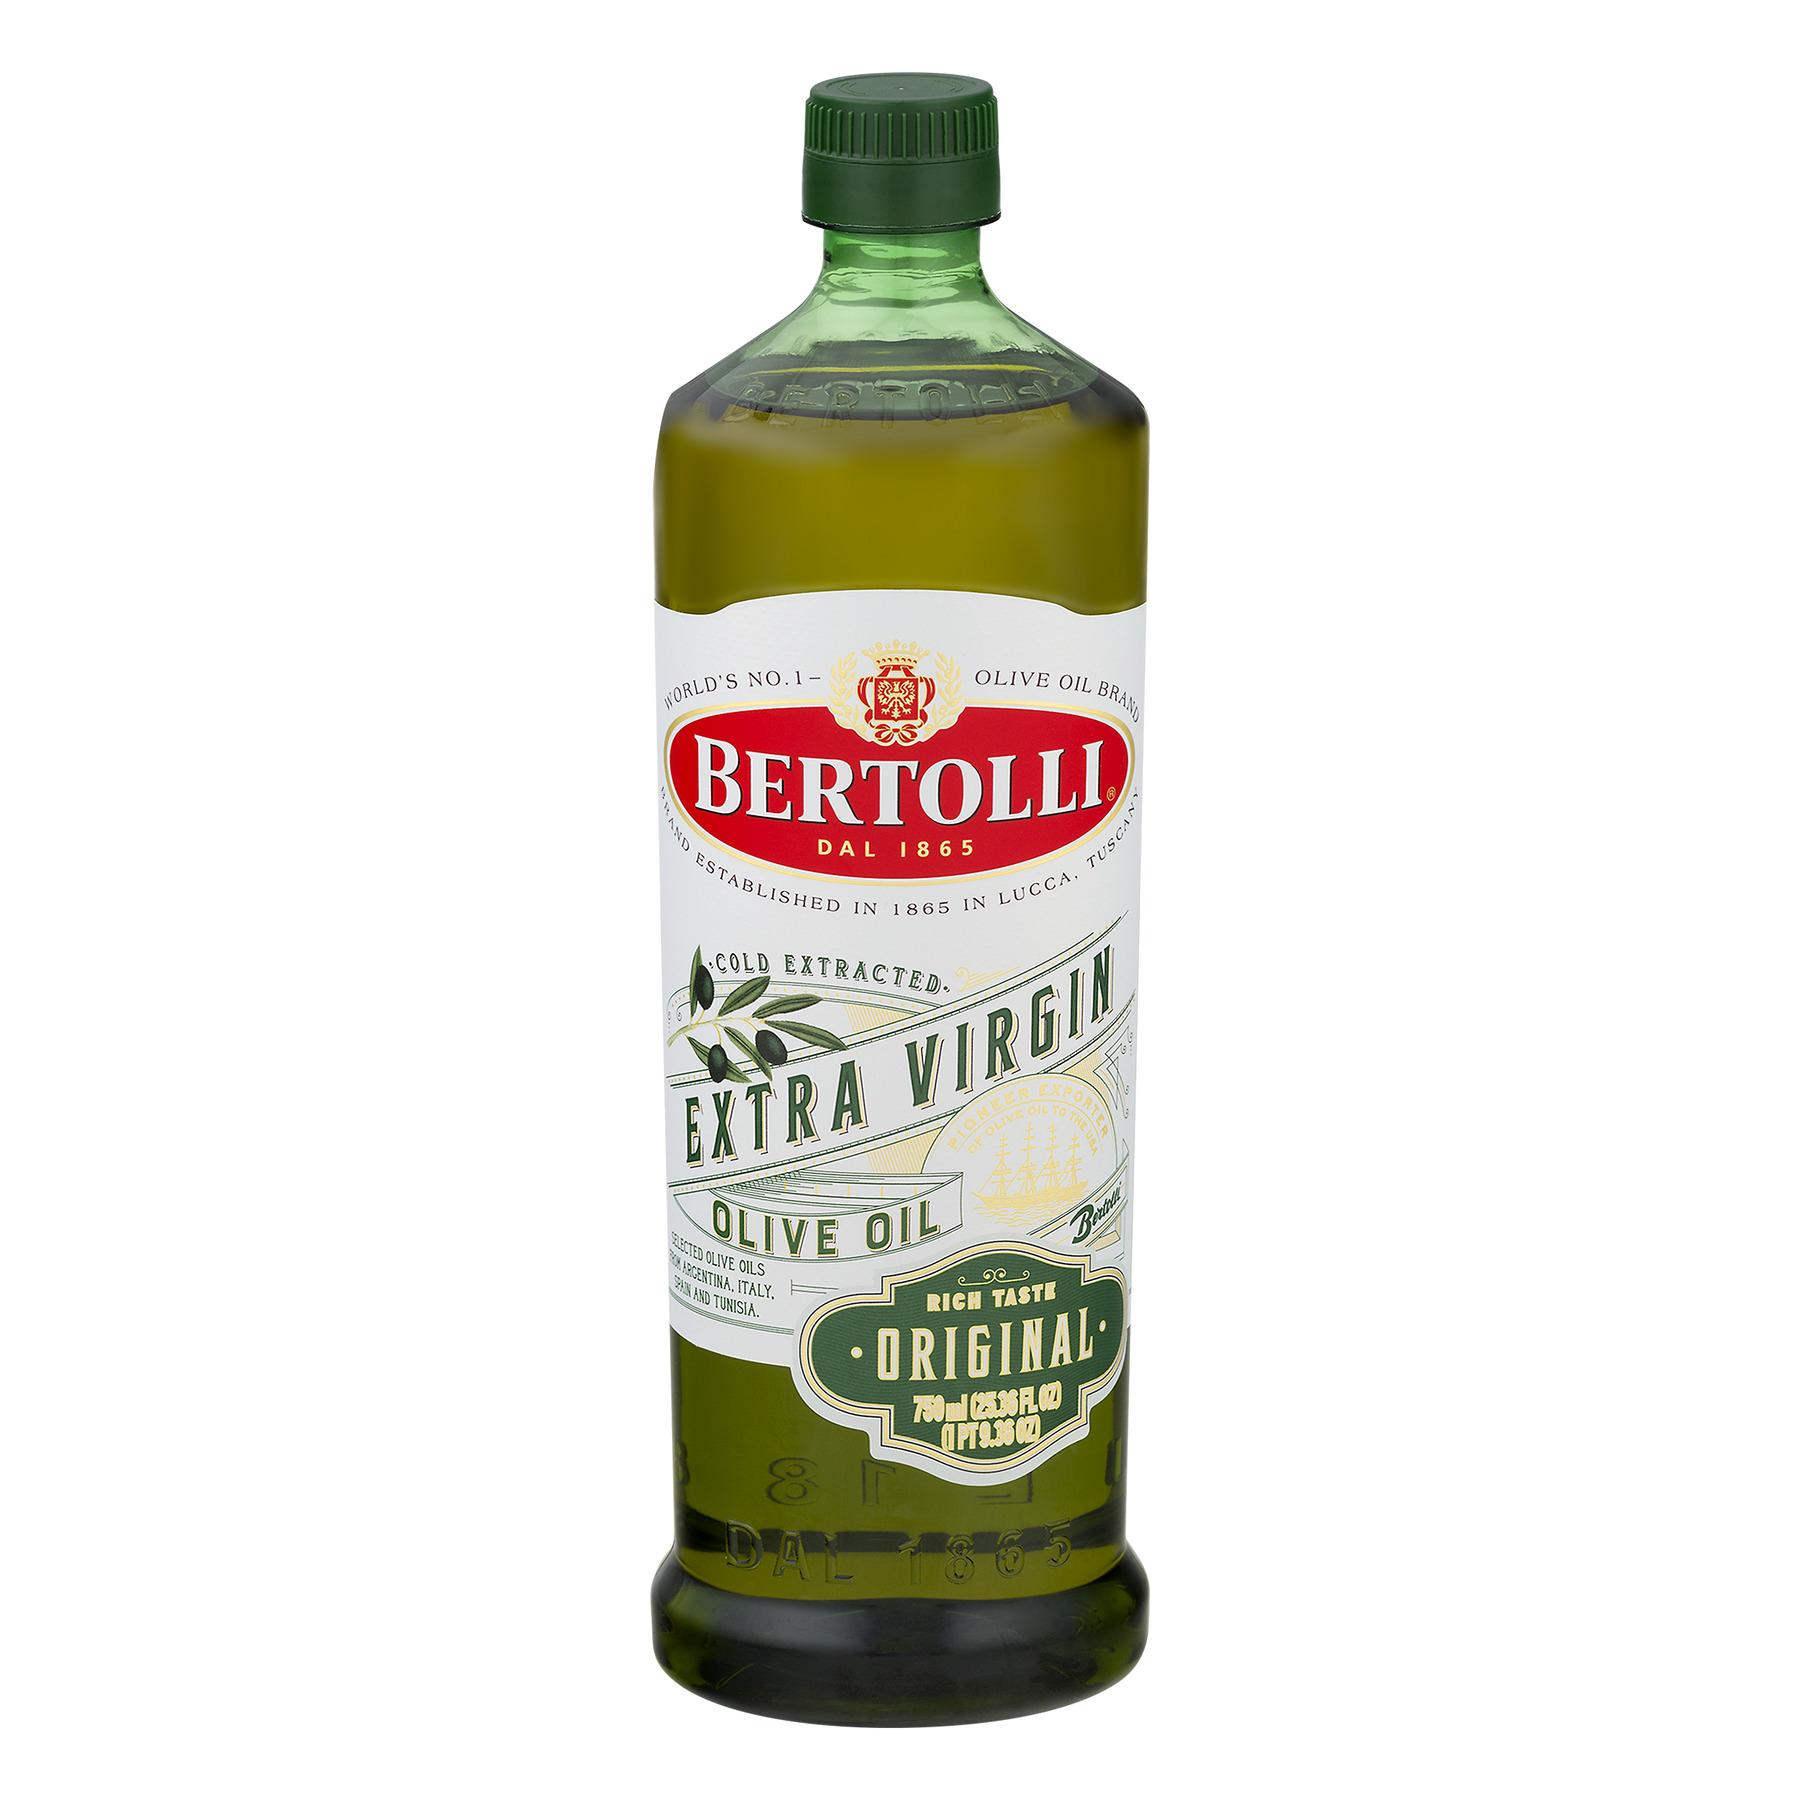 Remarkable, extra virgin olive oil el paso